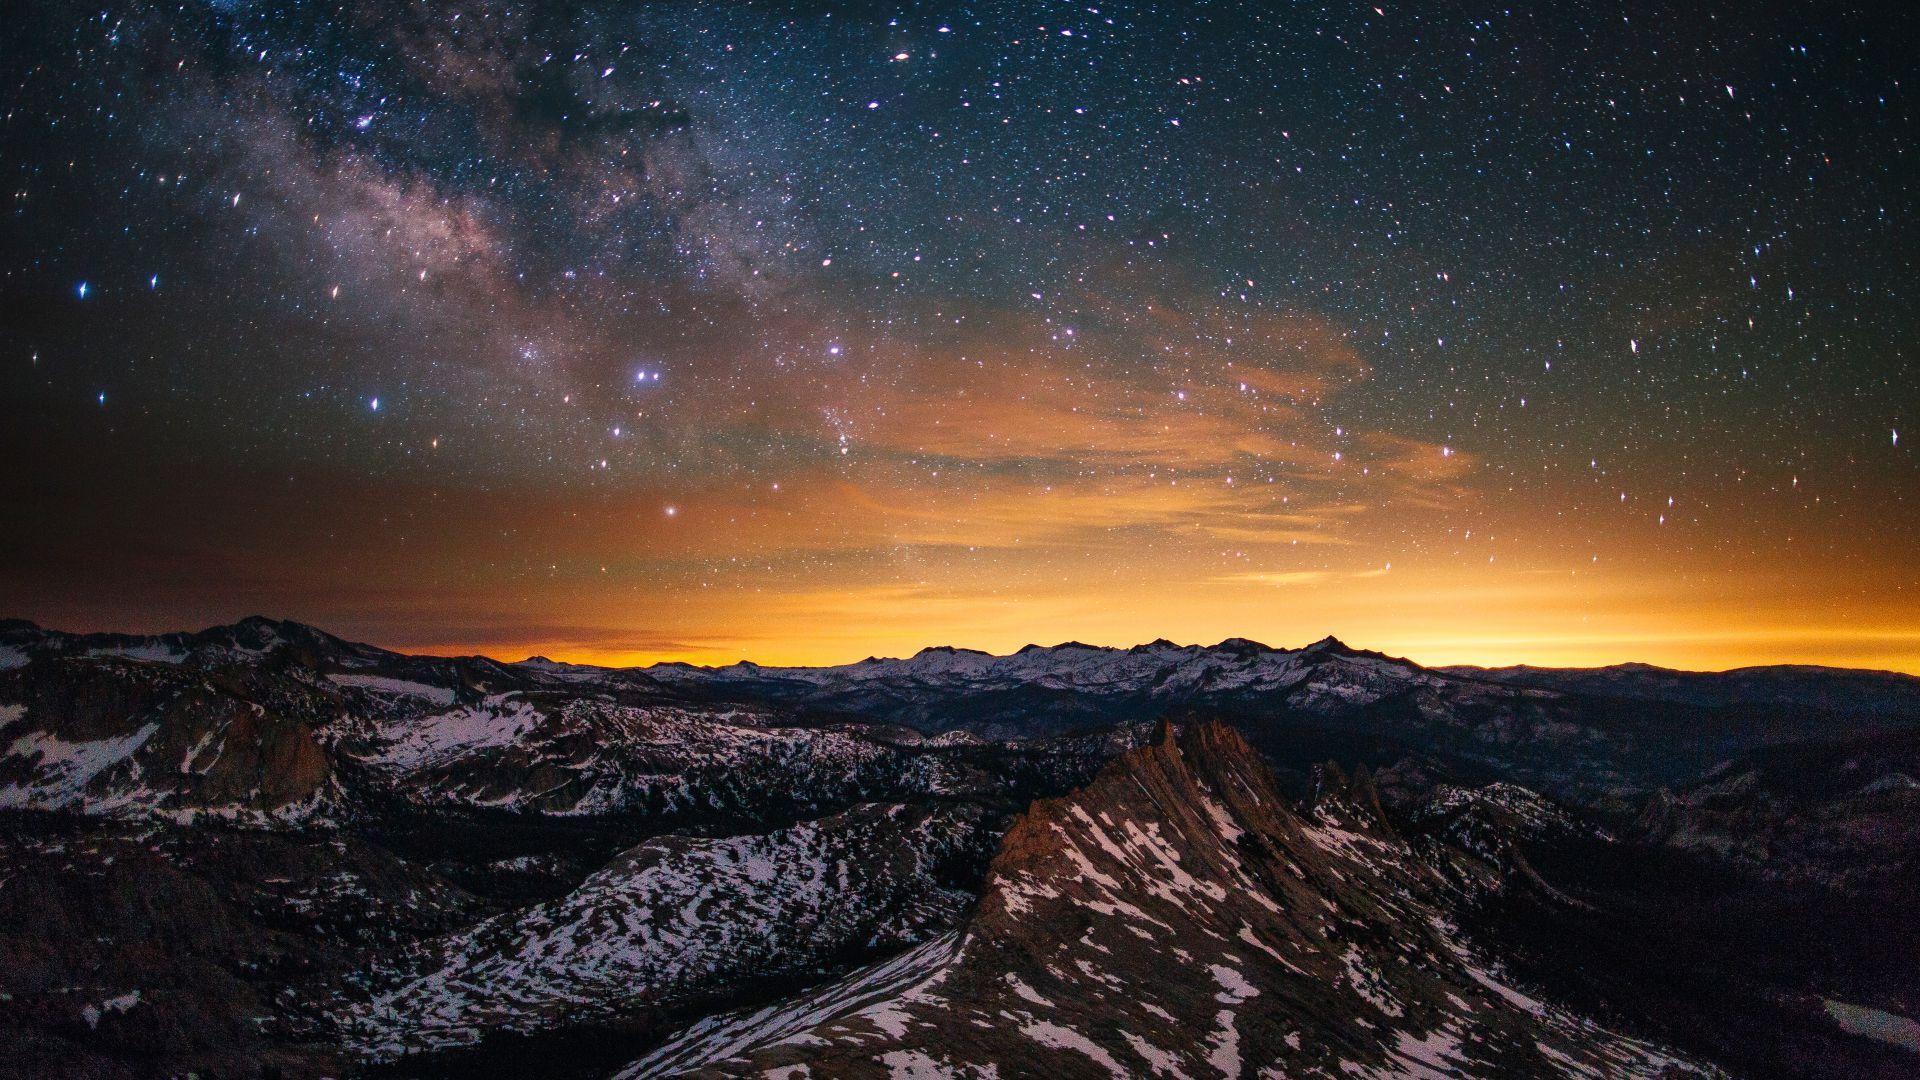 Yosemite 5k Wallpapers Forest Stars Sunset Osx Apple